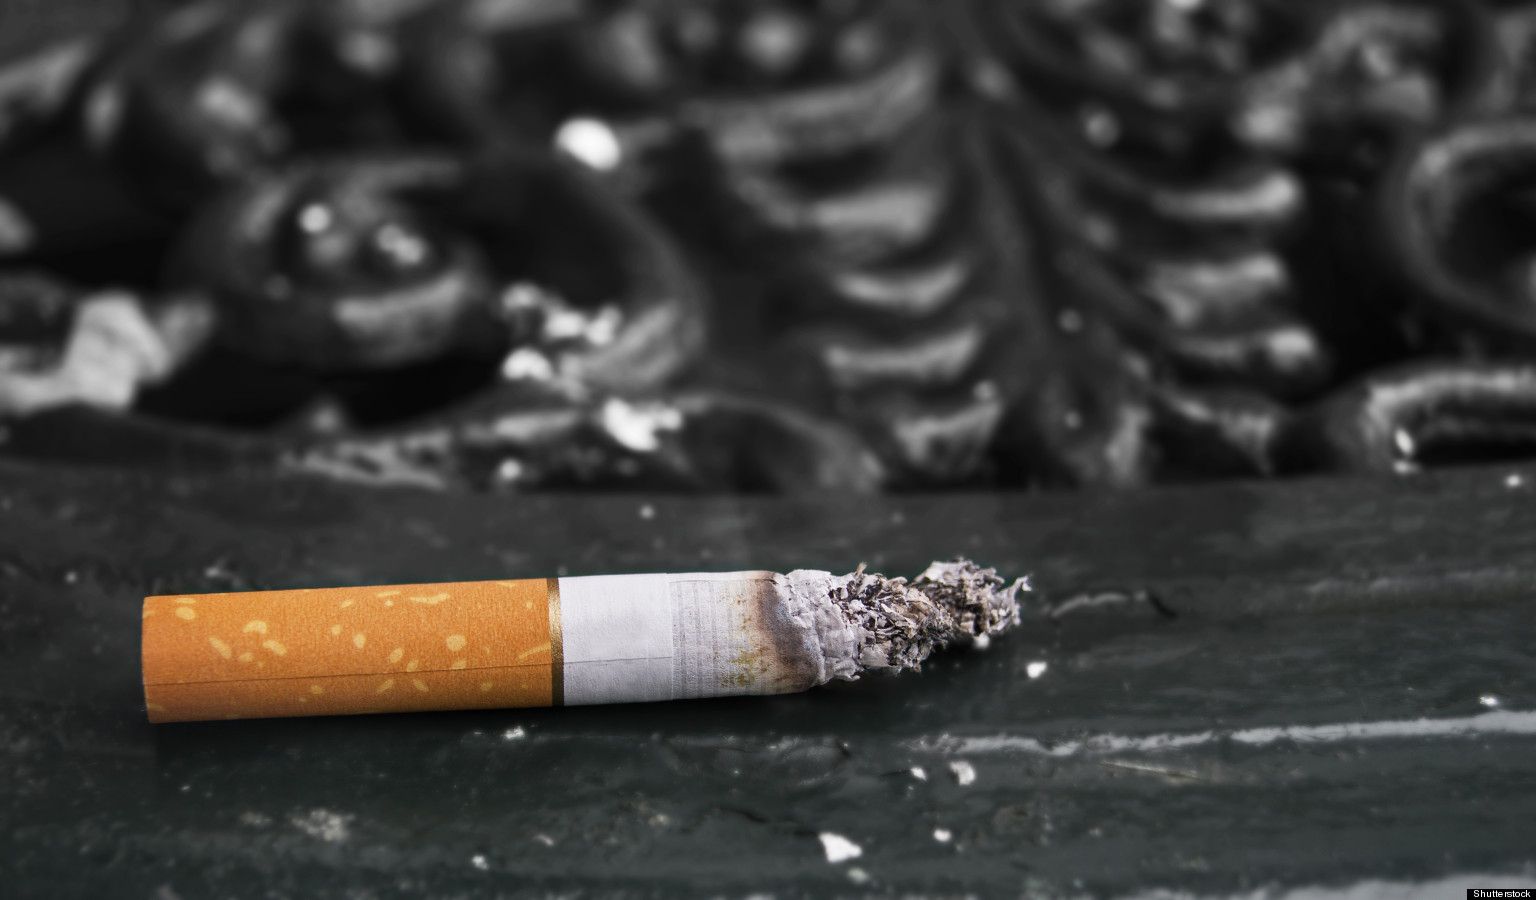 smoking a study into statistics essay